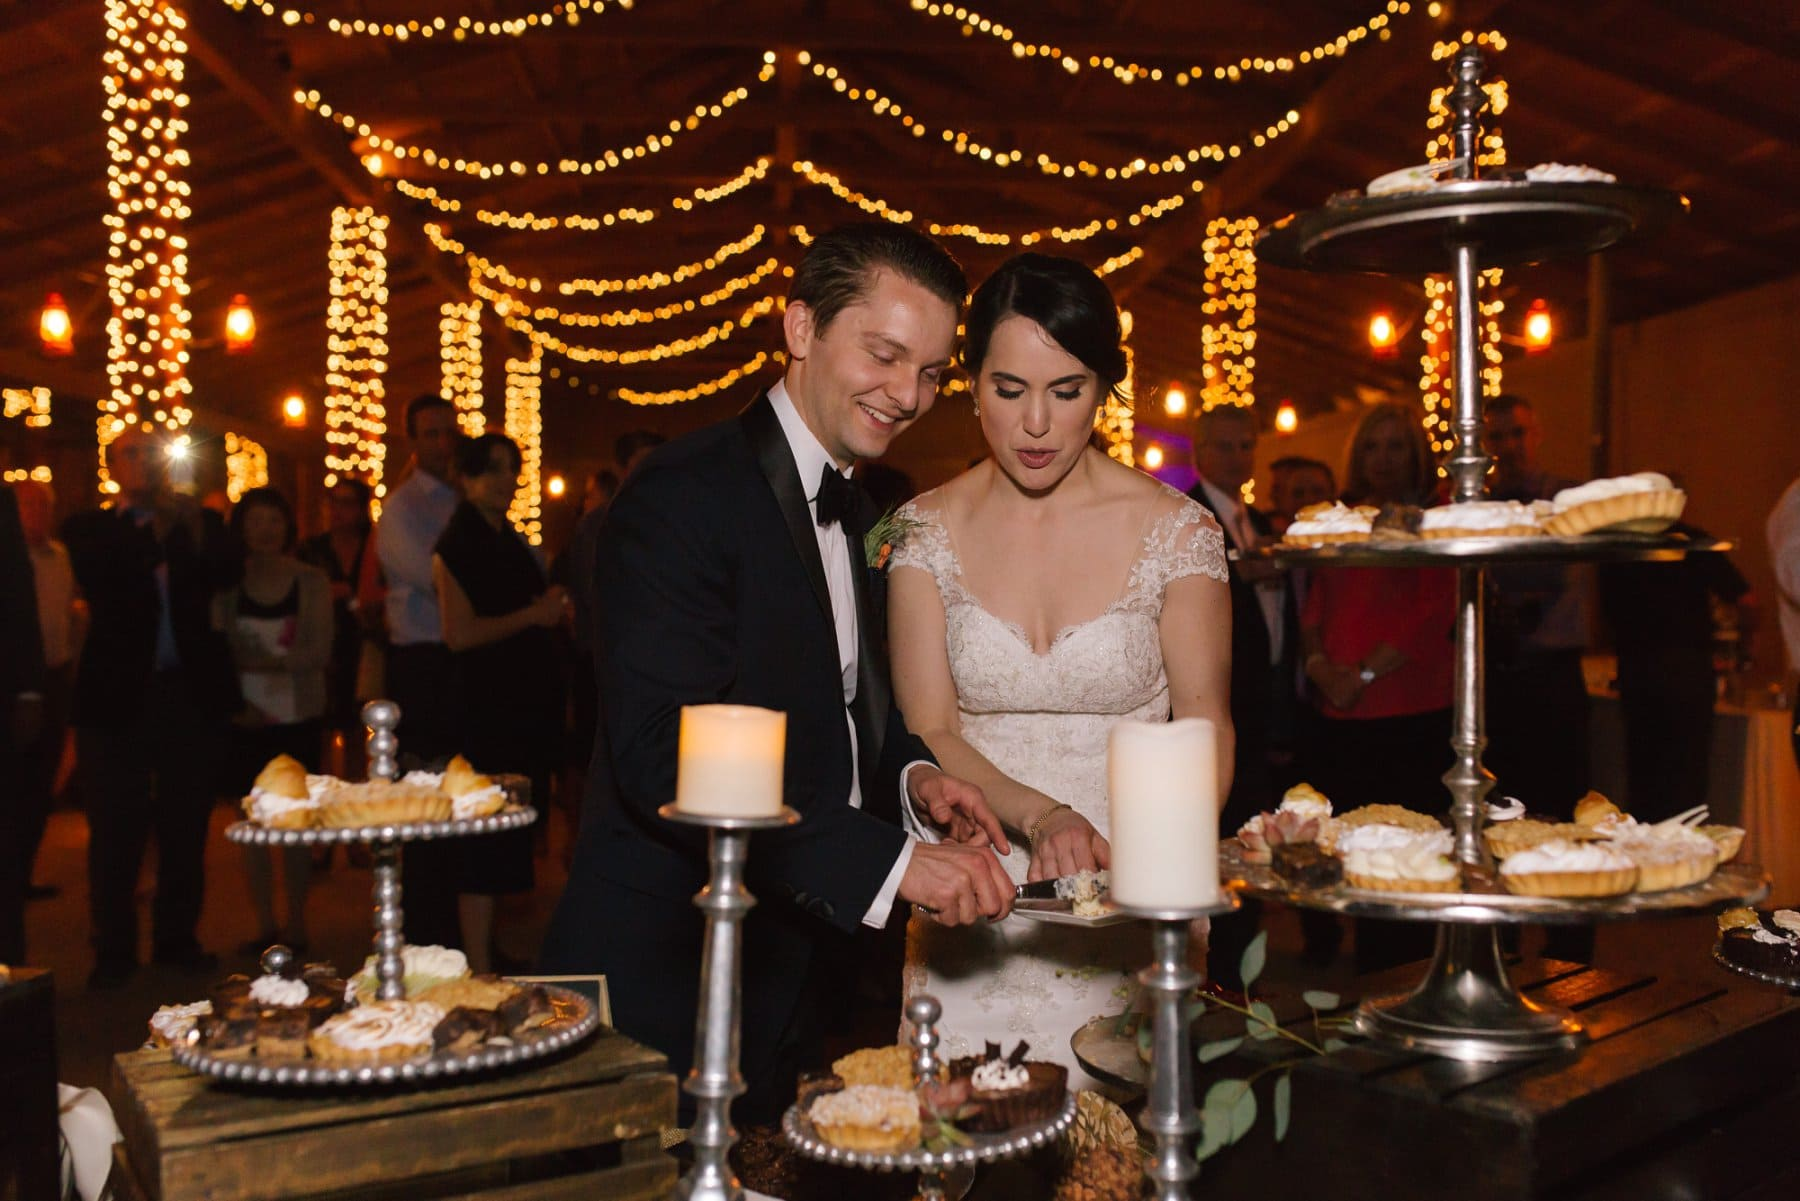 cutting wedding pie at Desert Foothills barn wedding Arizona